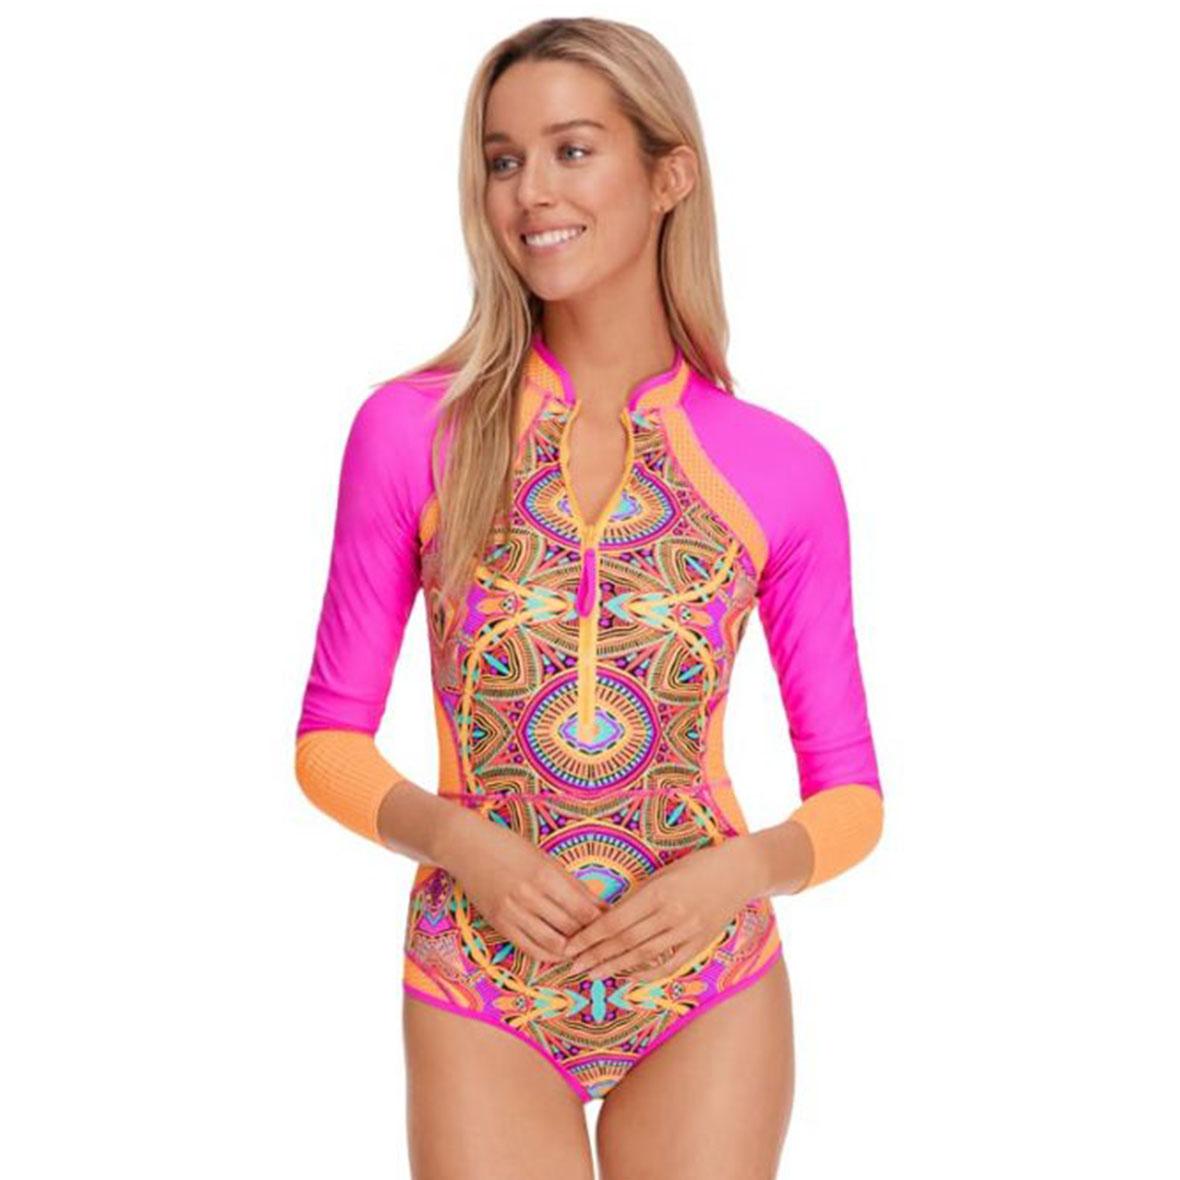 1fd2bb1d22 Body Glove Women s Iggy Paradise Paddle One-Piece Swimsuit